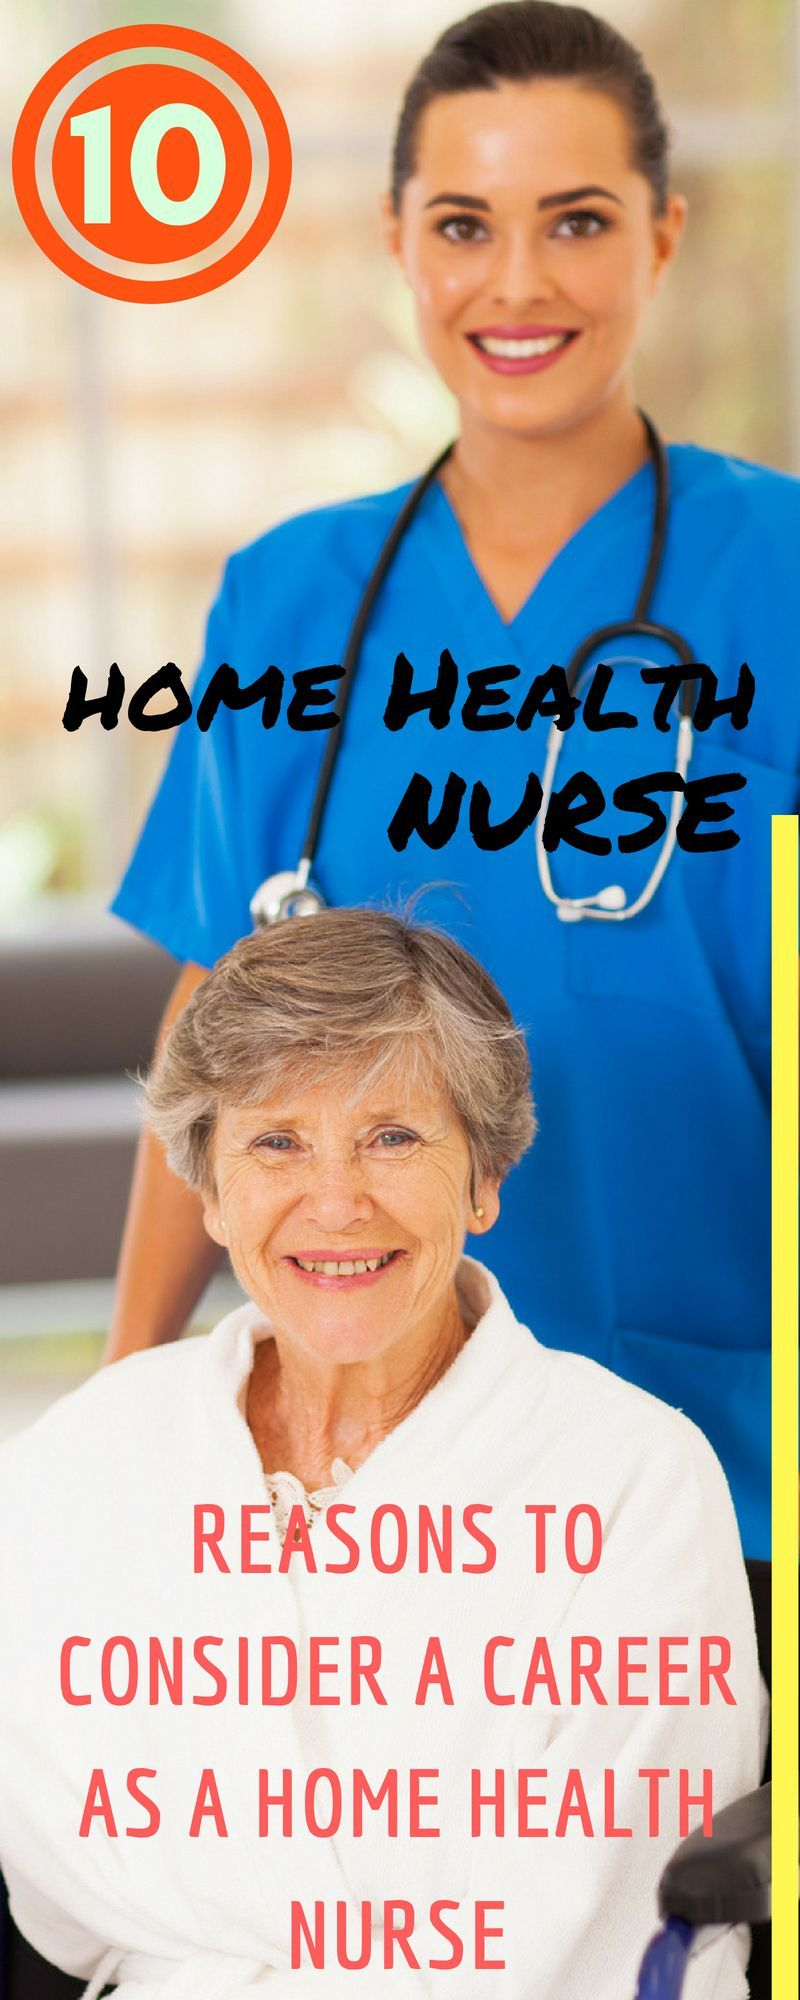 Nursing Home Admin Asst Home health nurse, Home health